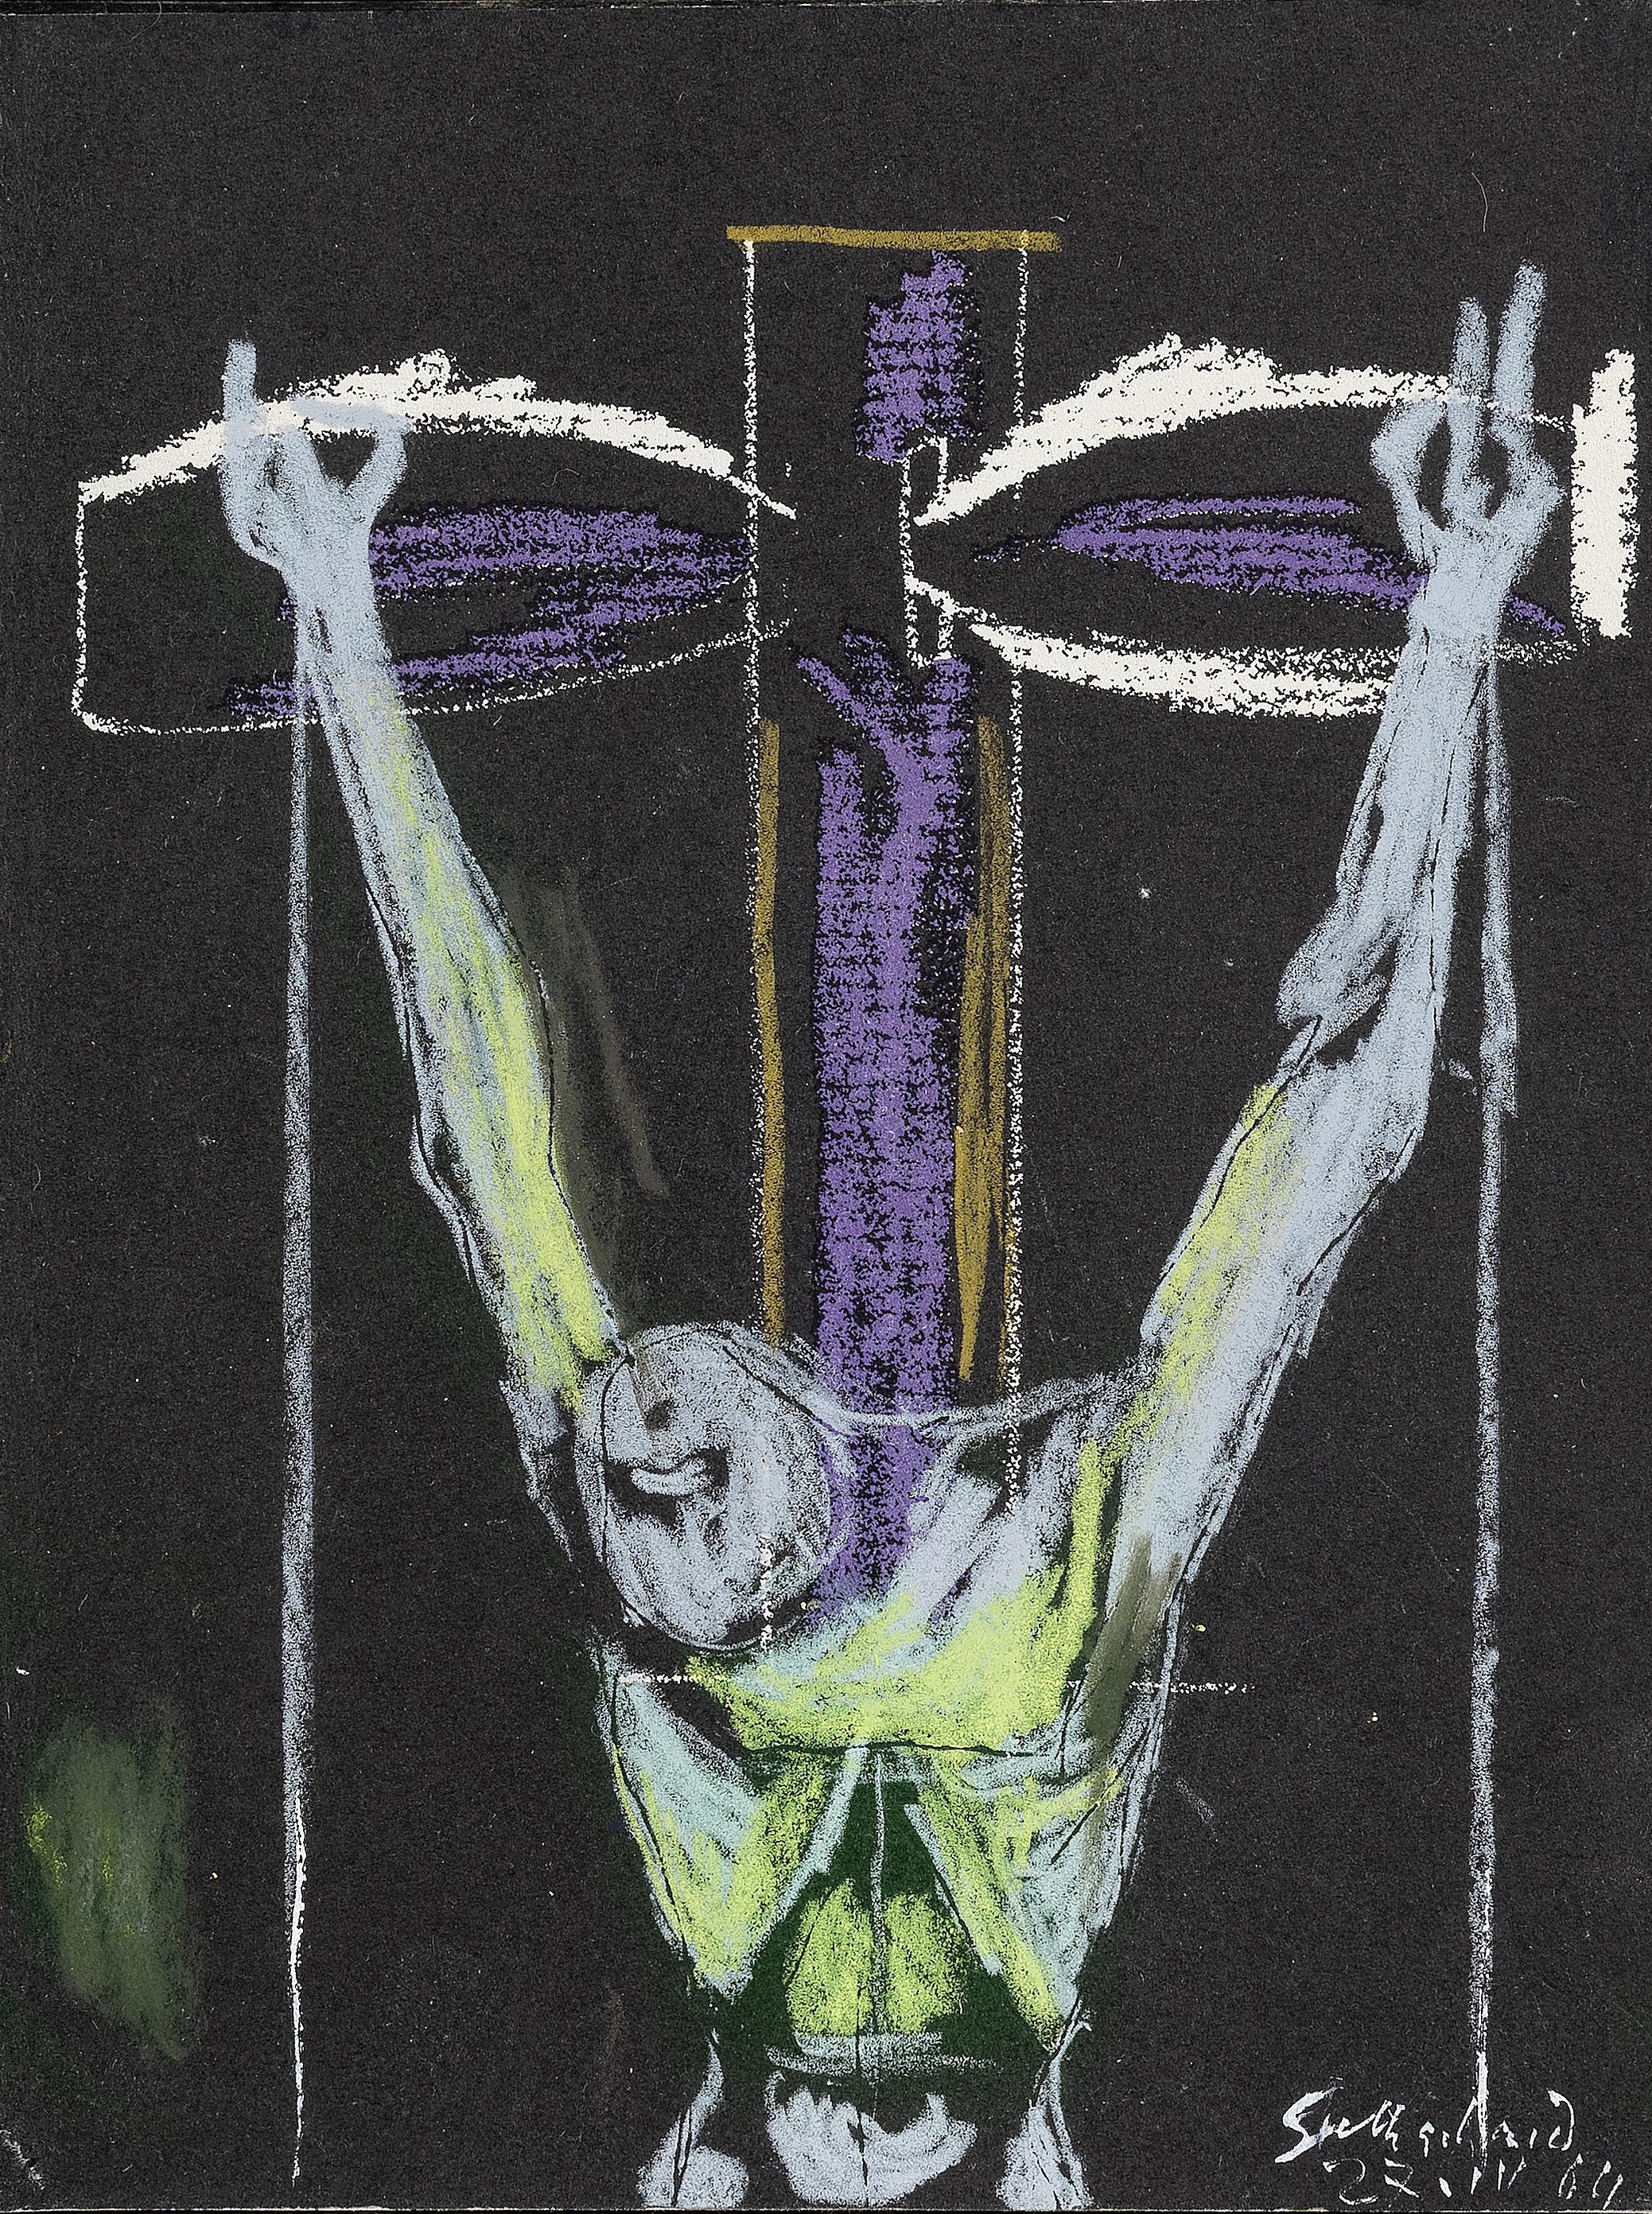 Graham Sutherland O.M. (British, 1903-1980) Crucifixion II 21.5 x 16.2 cm. (8 3/8 x 6 3/8 in.)